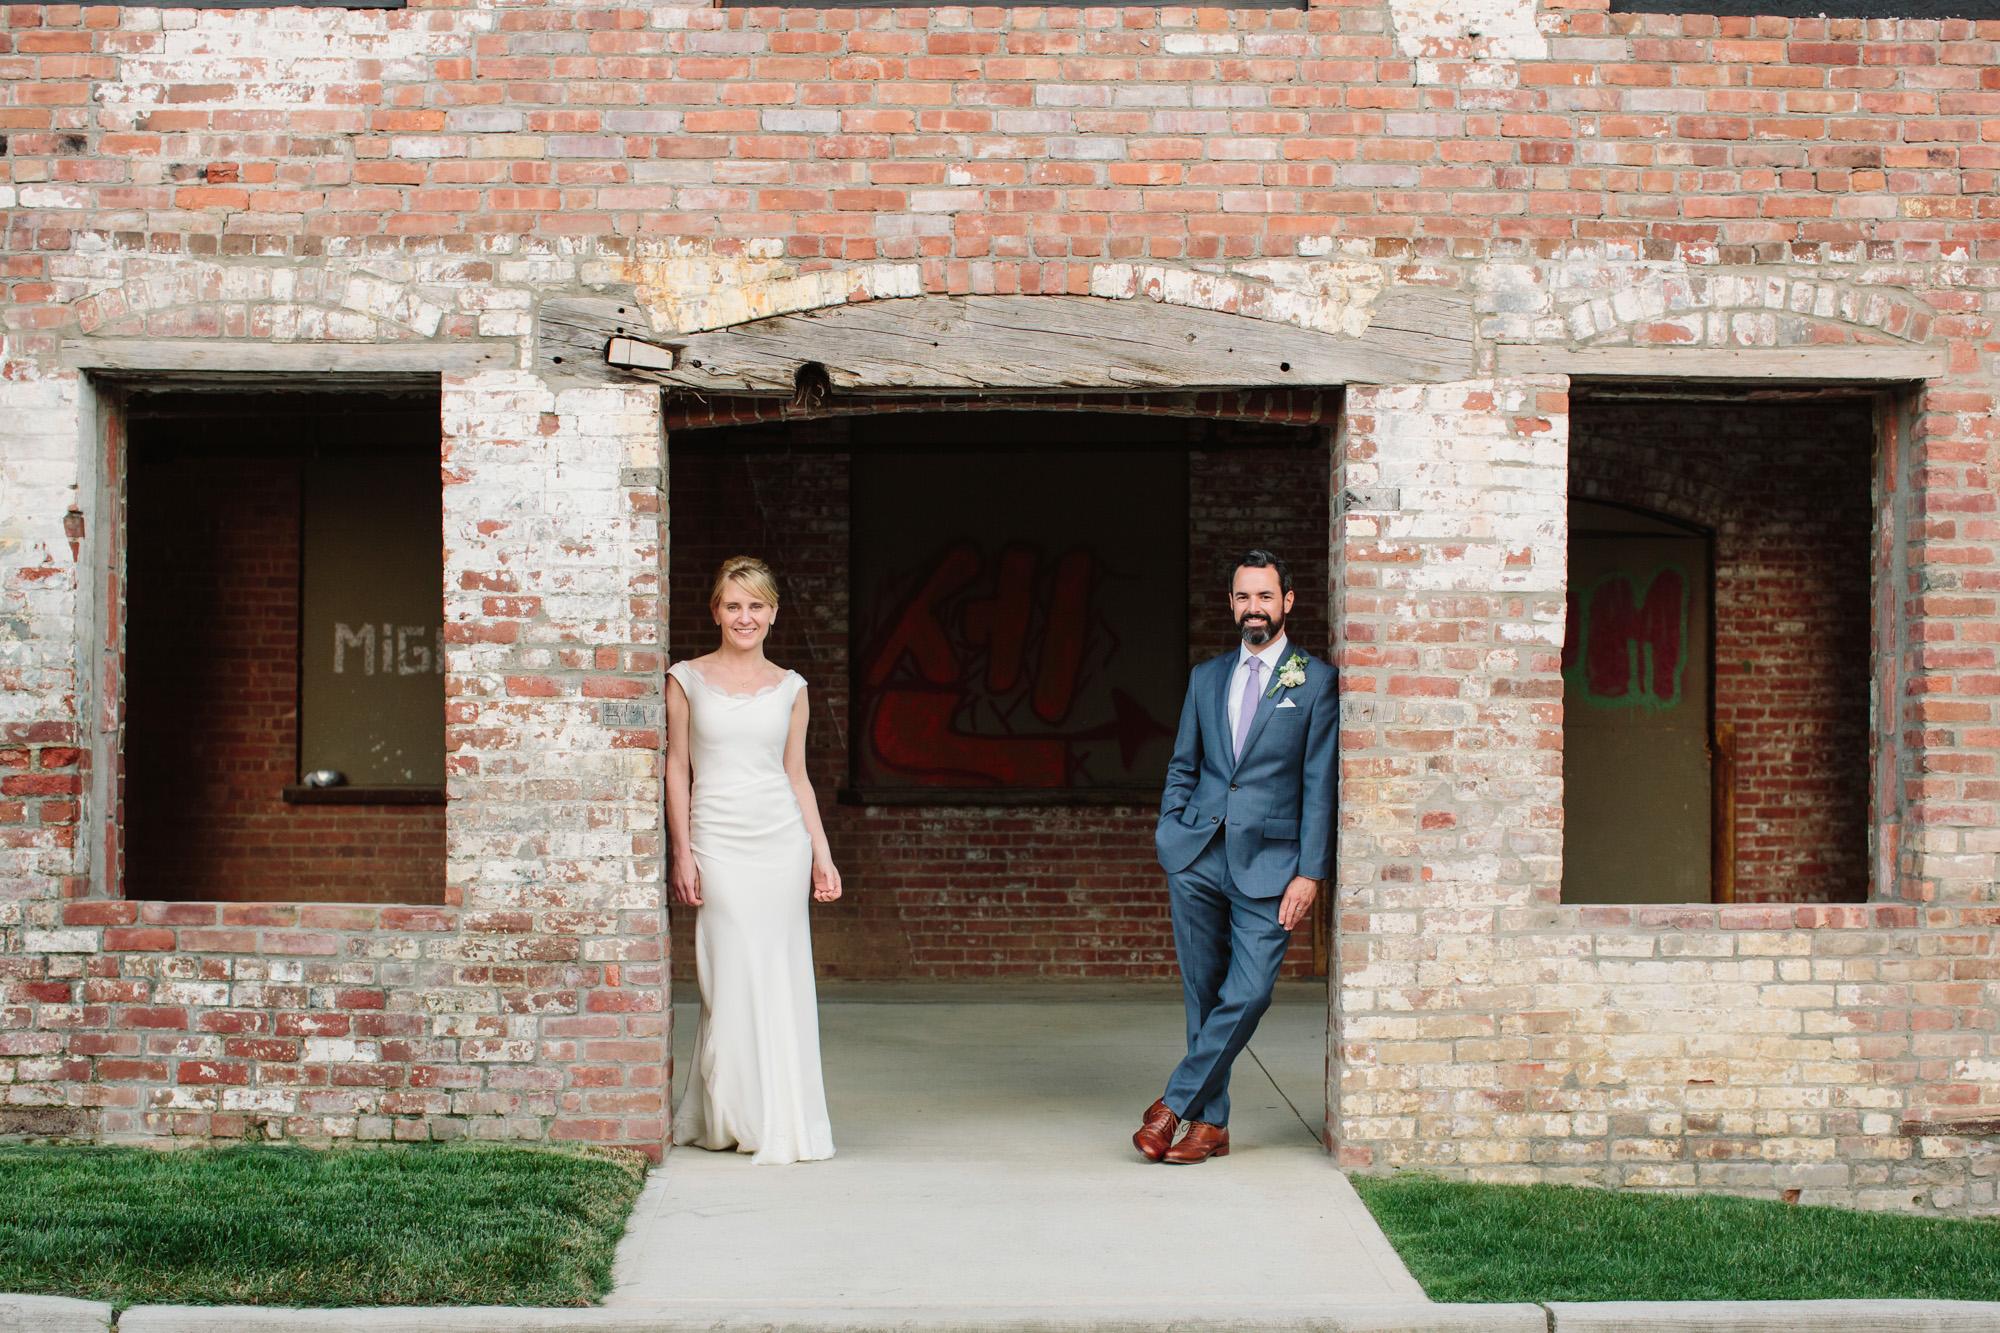 65_Rowan_Brian_The_Roundhouse_Wedding_Beacon_NY_Tanya_Salazar_Photography_326.jpg